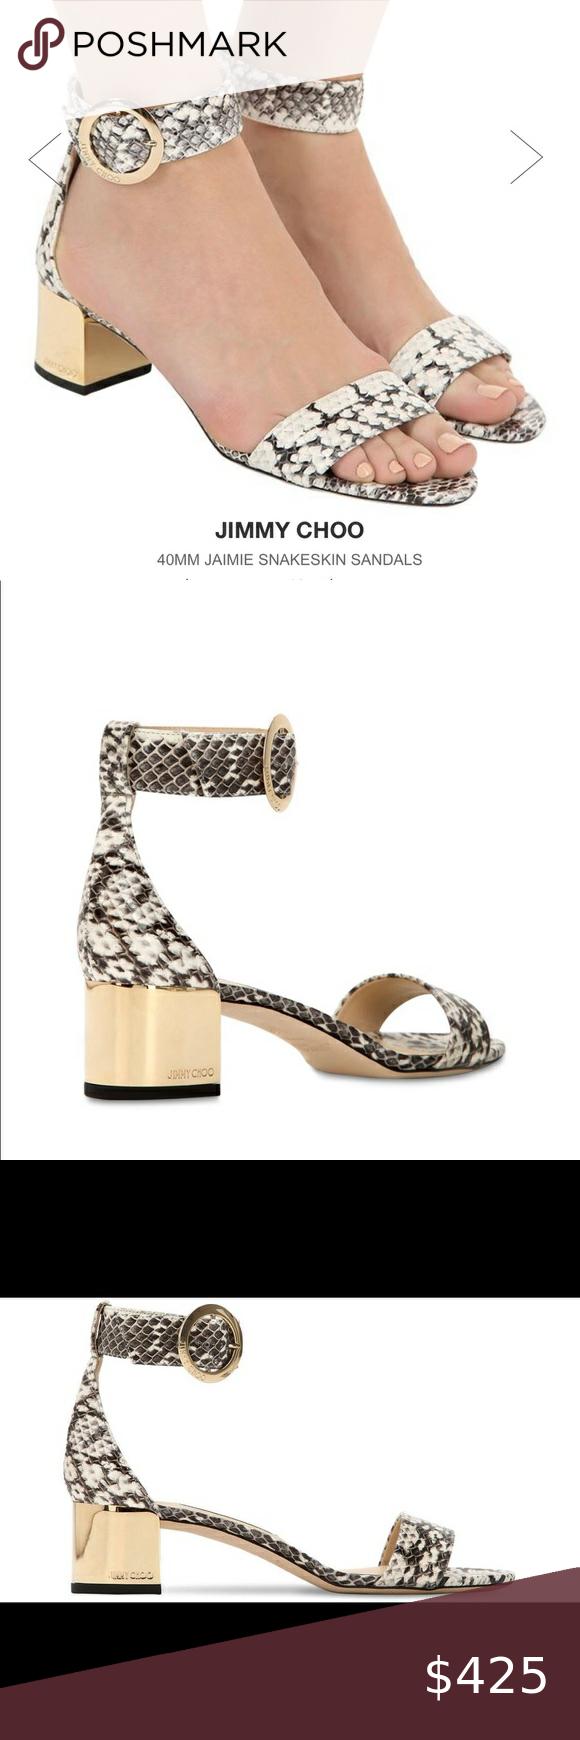 Jimmy Choo Jaimie Snakeskin Sandals Nwt 750 In 2020 Jimmy Choo Jimmy Choo Shoes Heels Shoes Women Heels